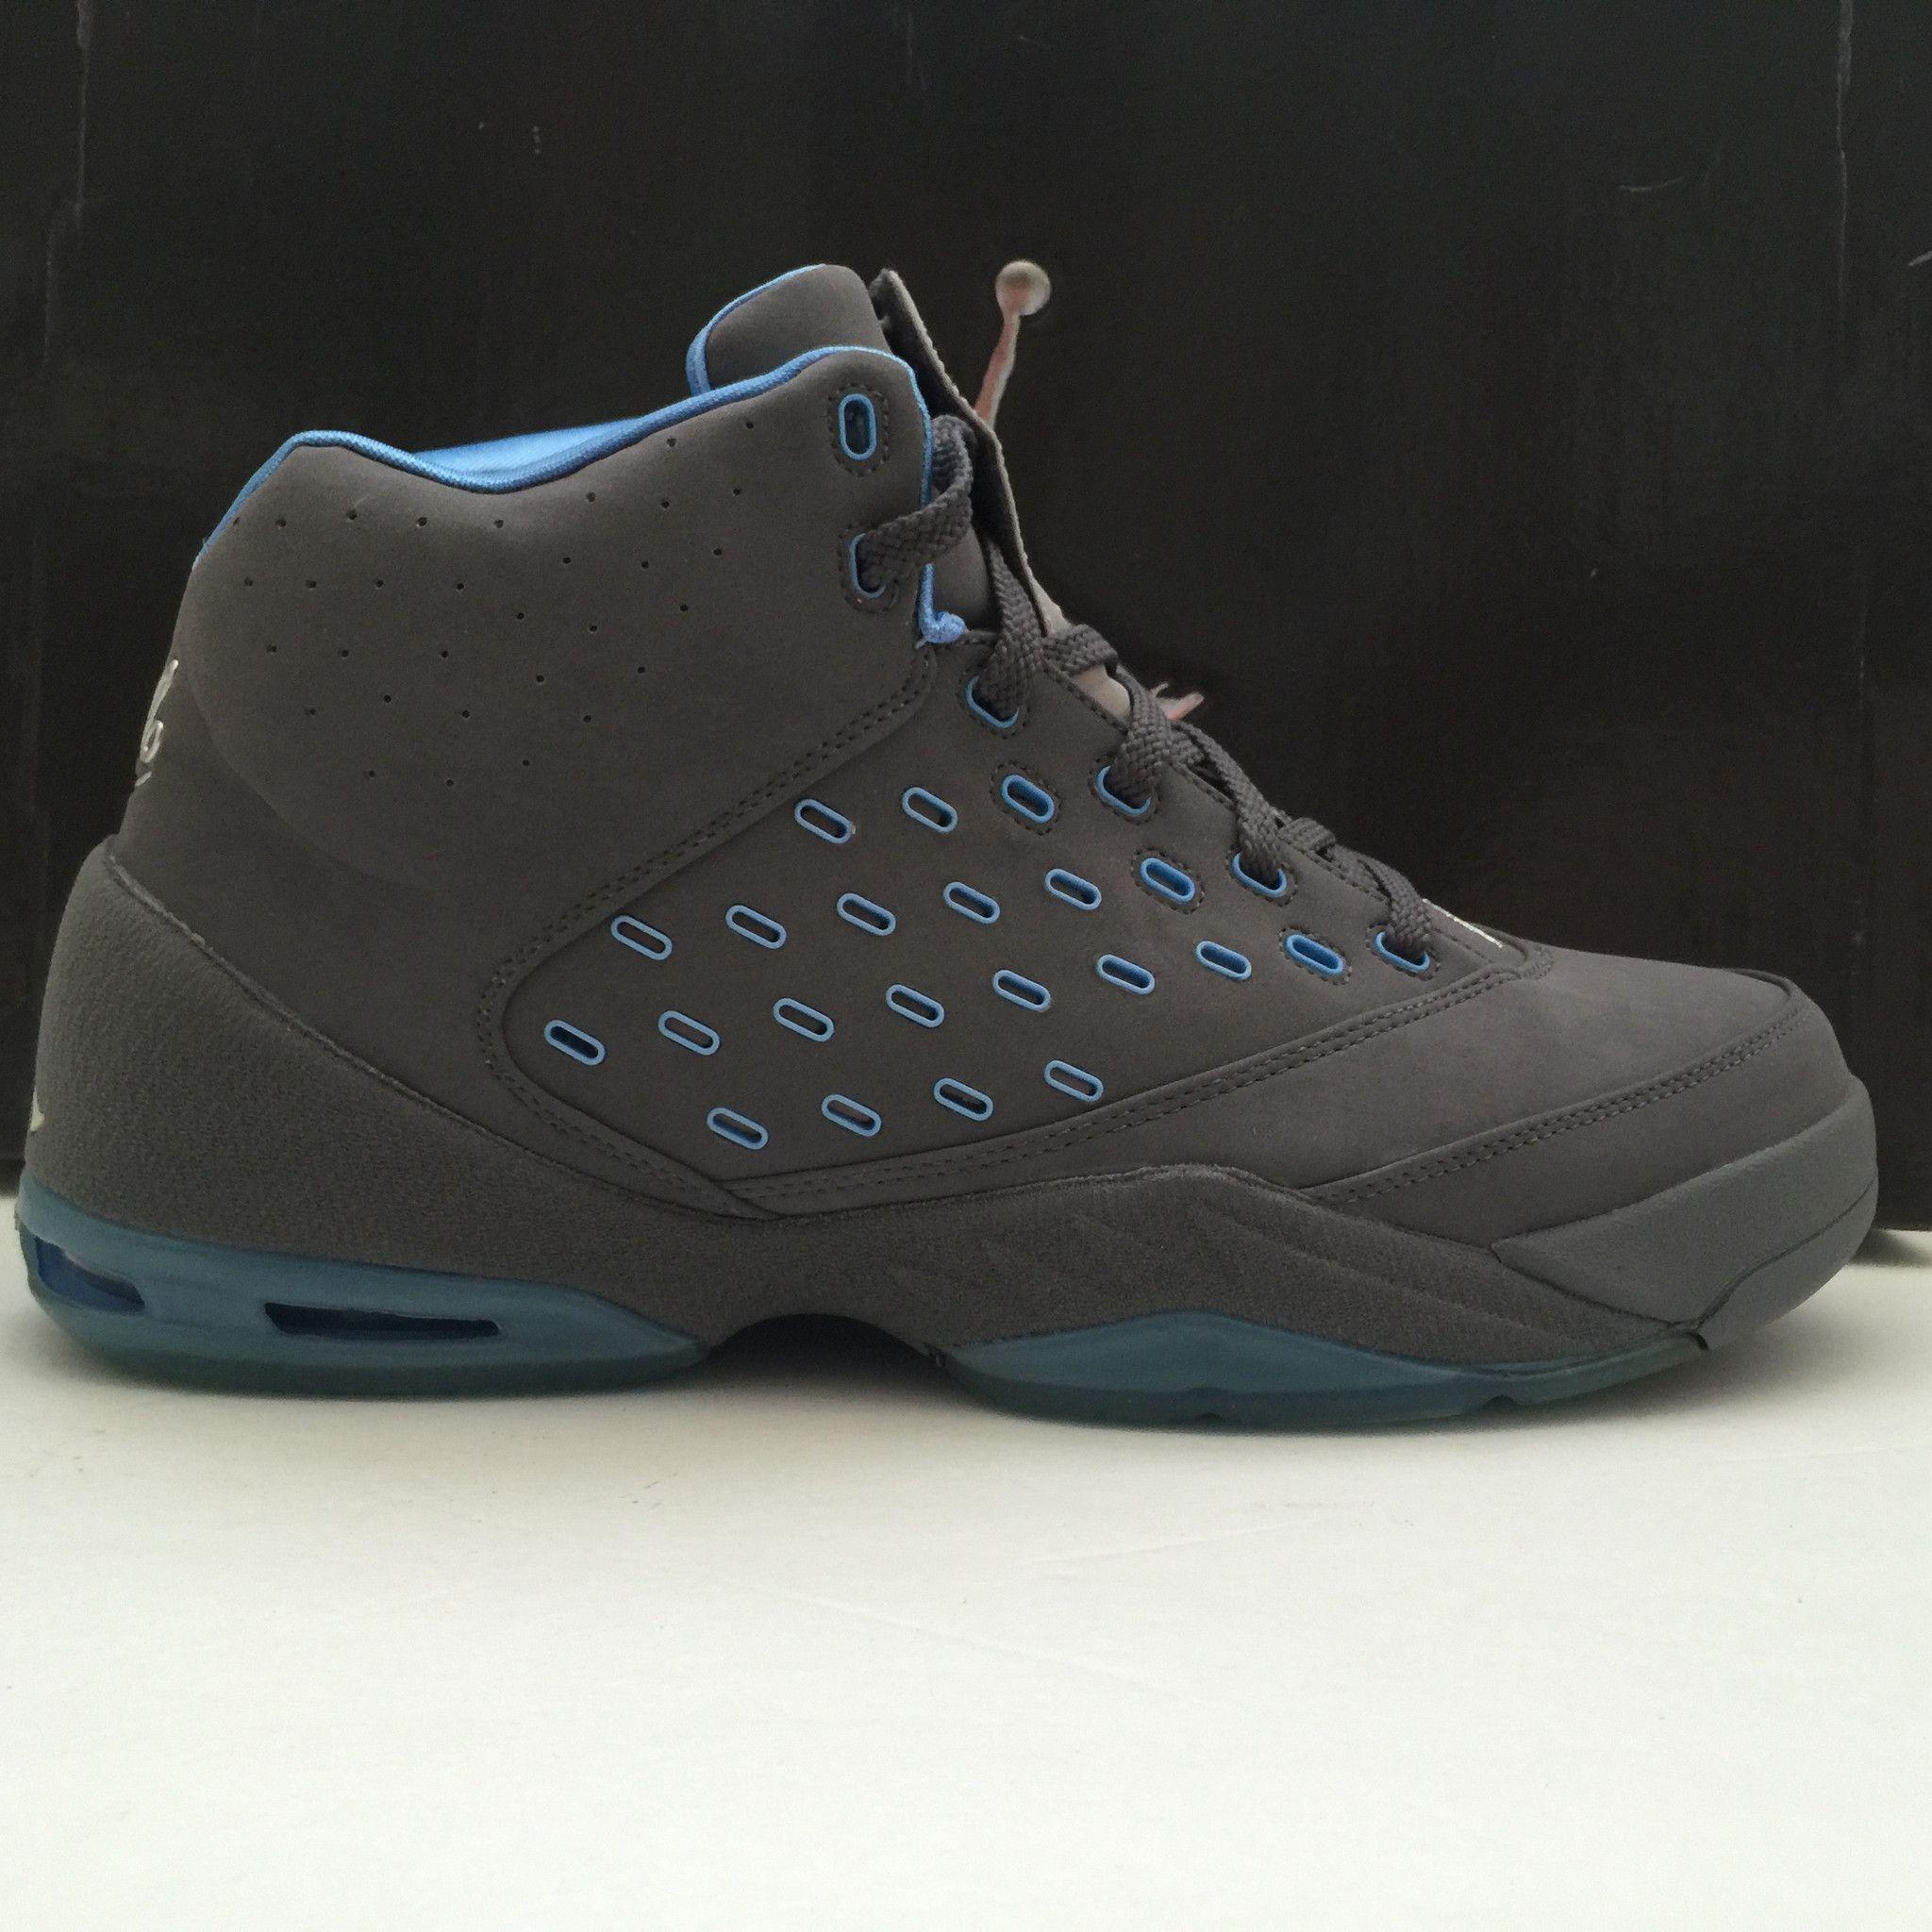 Habubu artiglieria Fai squadra con  DS Nike Air Jordan Melo 5.5 Size 13 | Air jordans, Nike, Nike air jordan